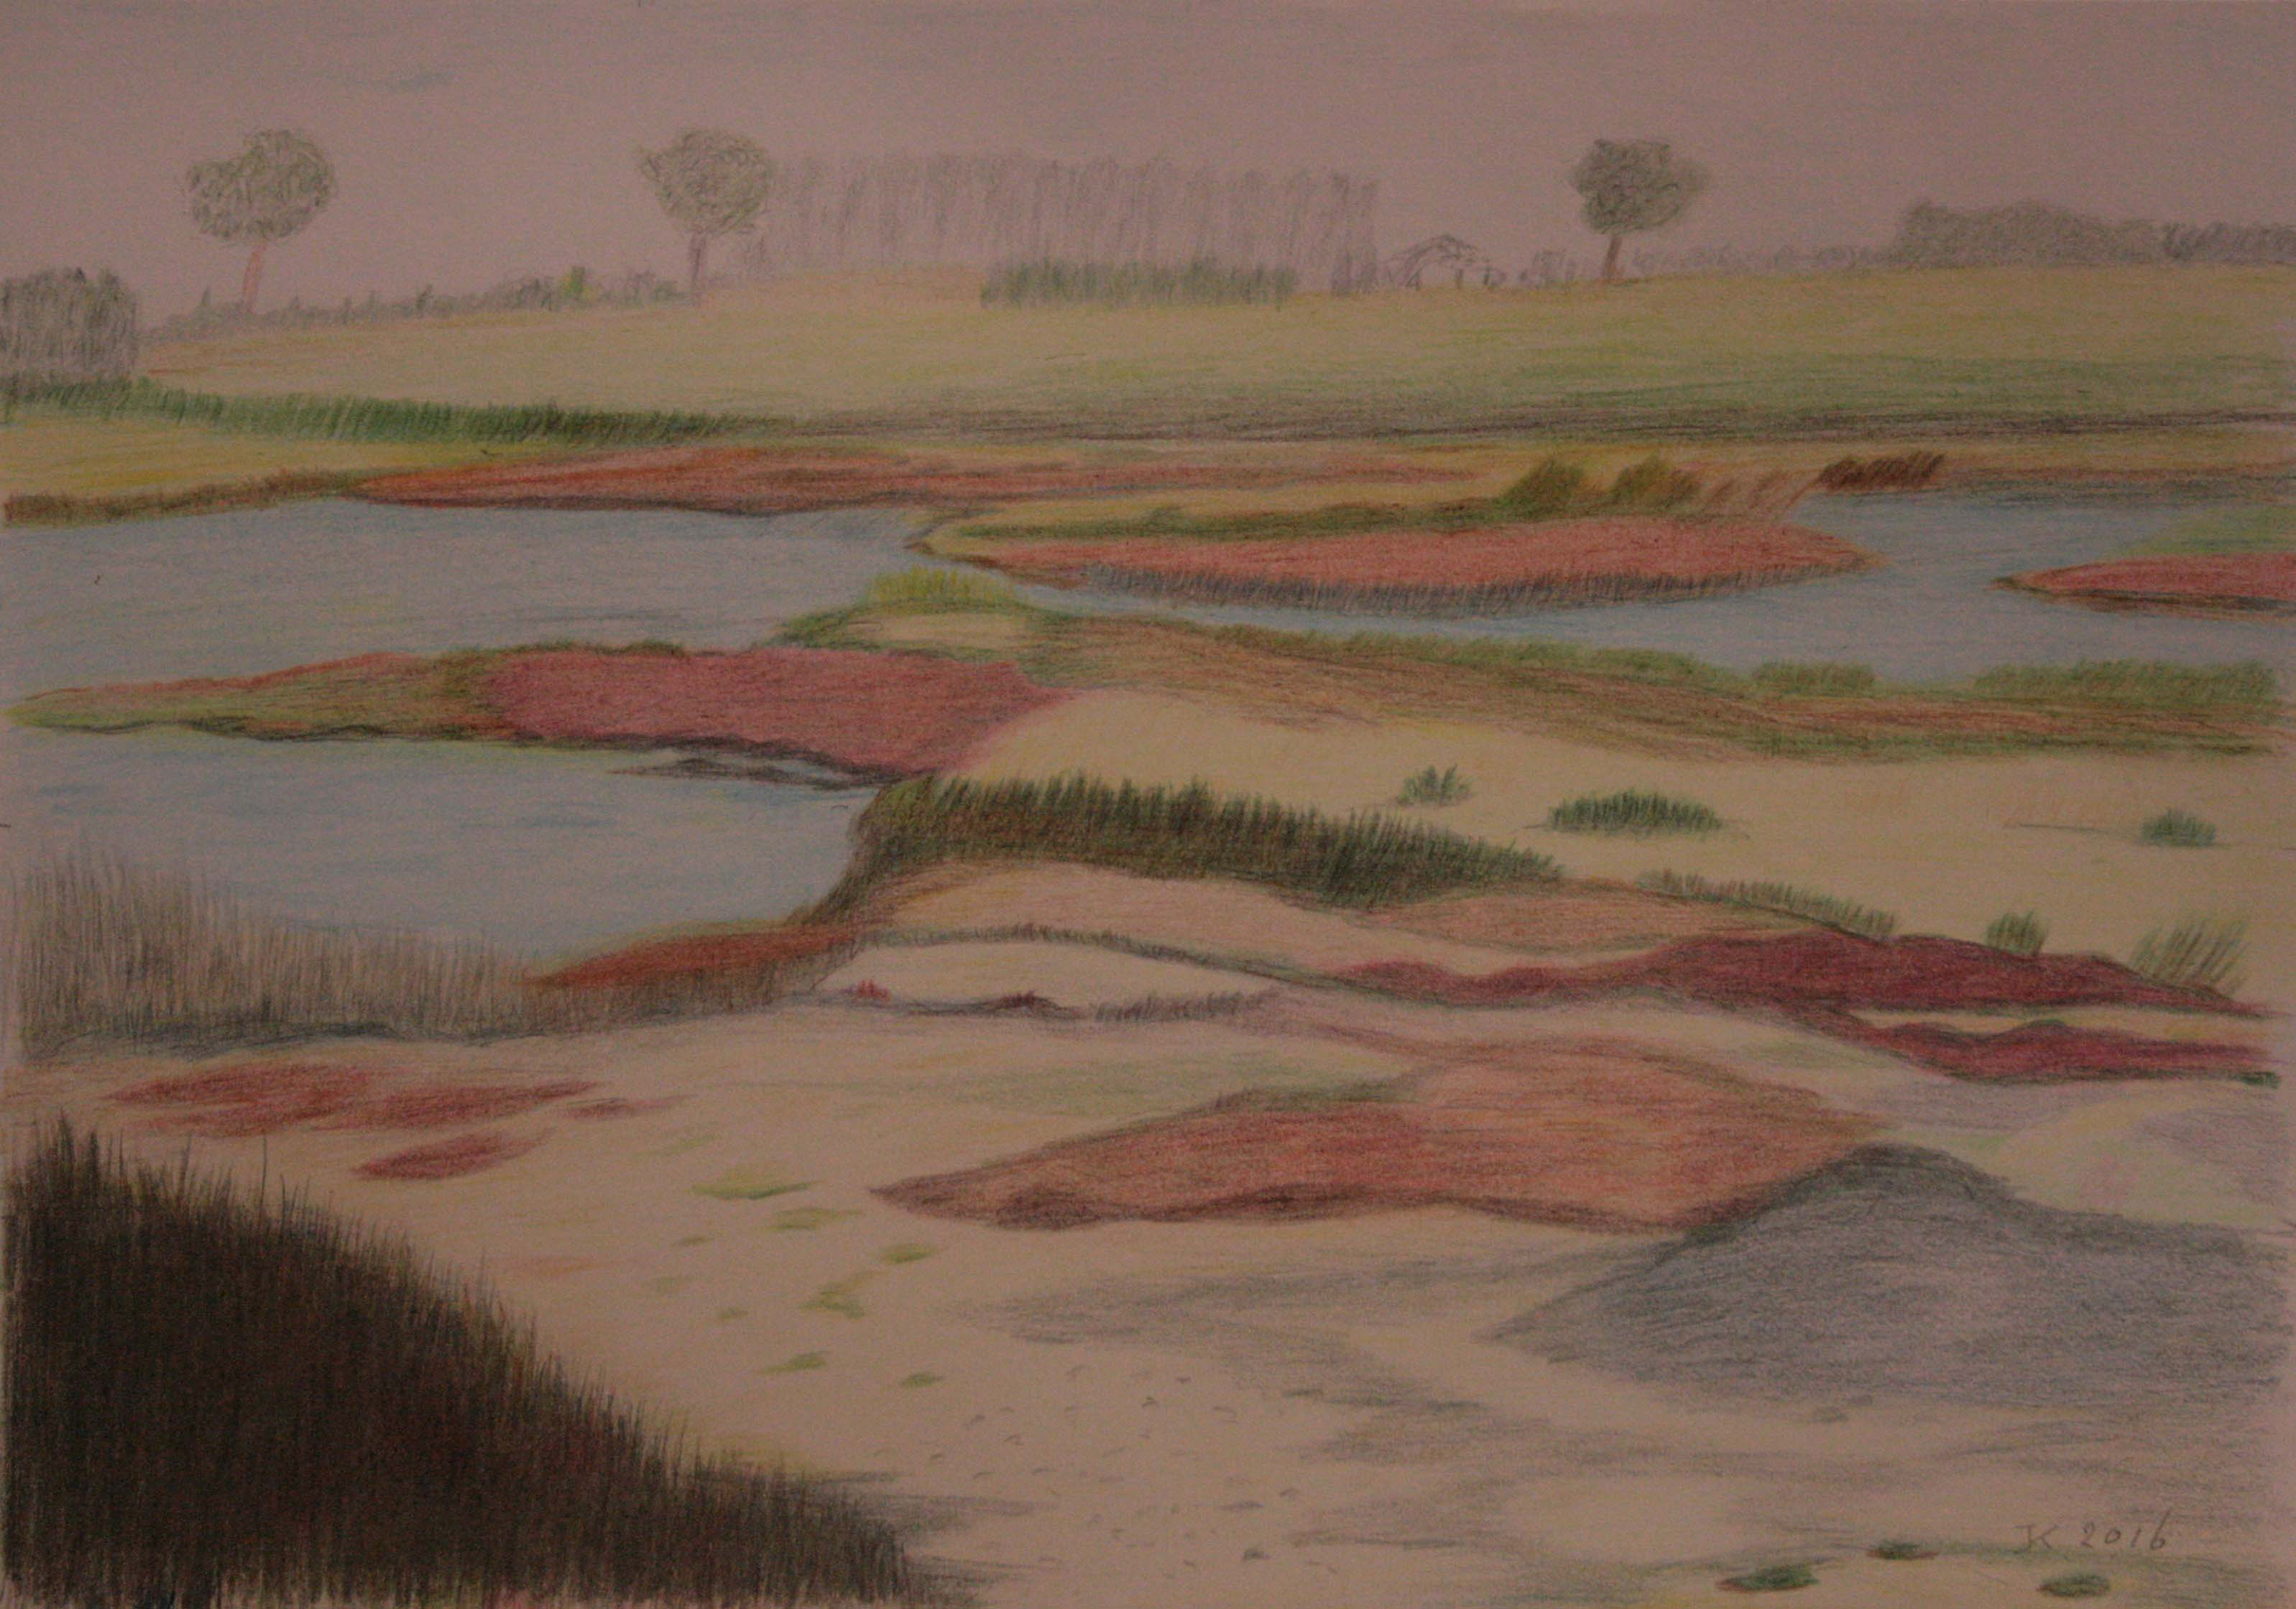 kleurpotlood op papier 42x30 cm